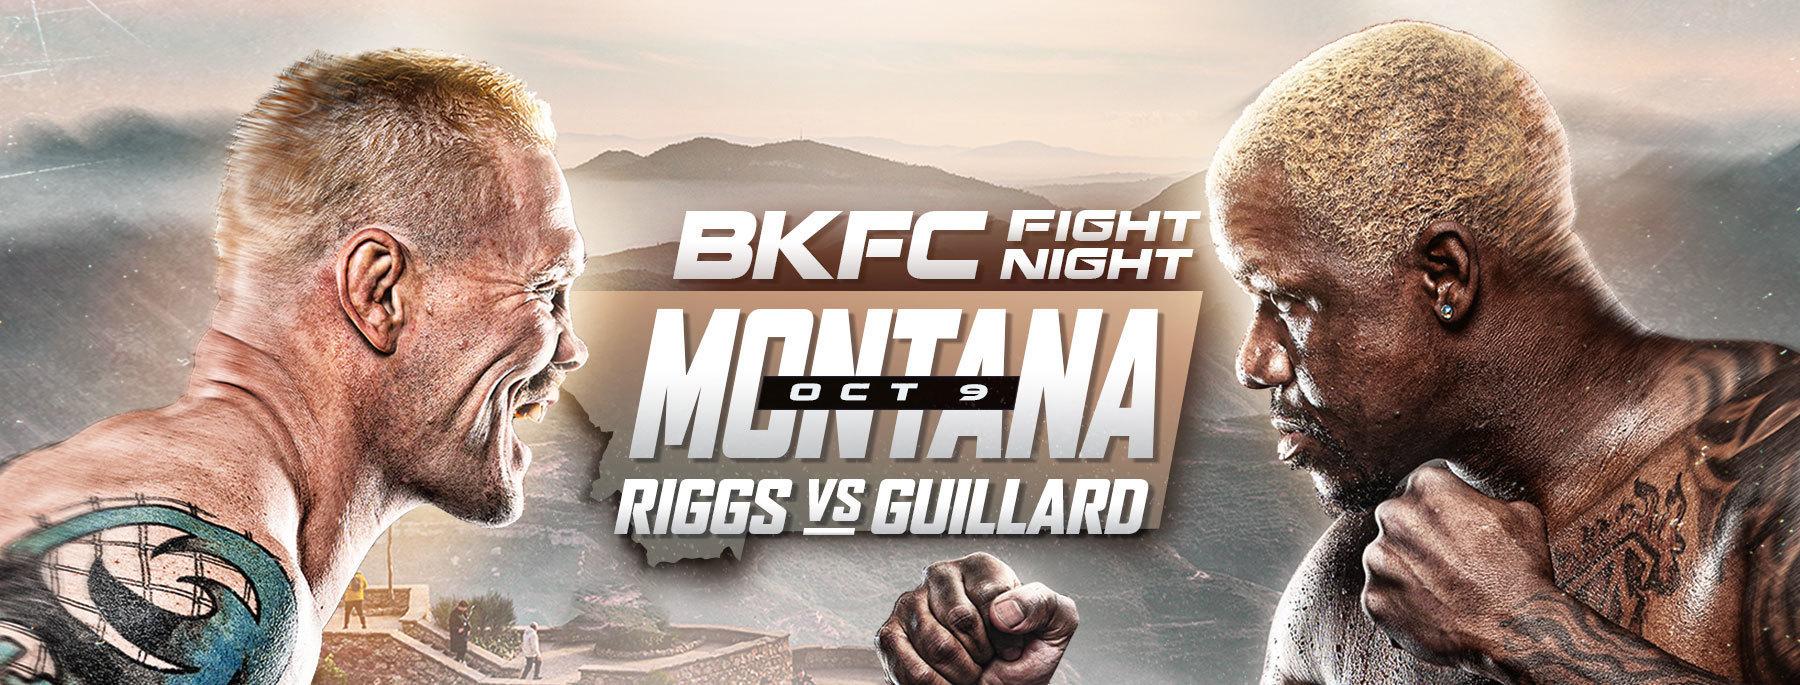 Watch BKFC Montana fight card - Joe Riggs vs. Melvin Guillard